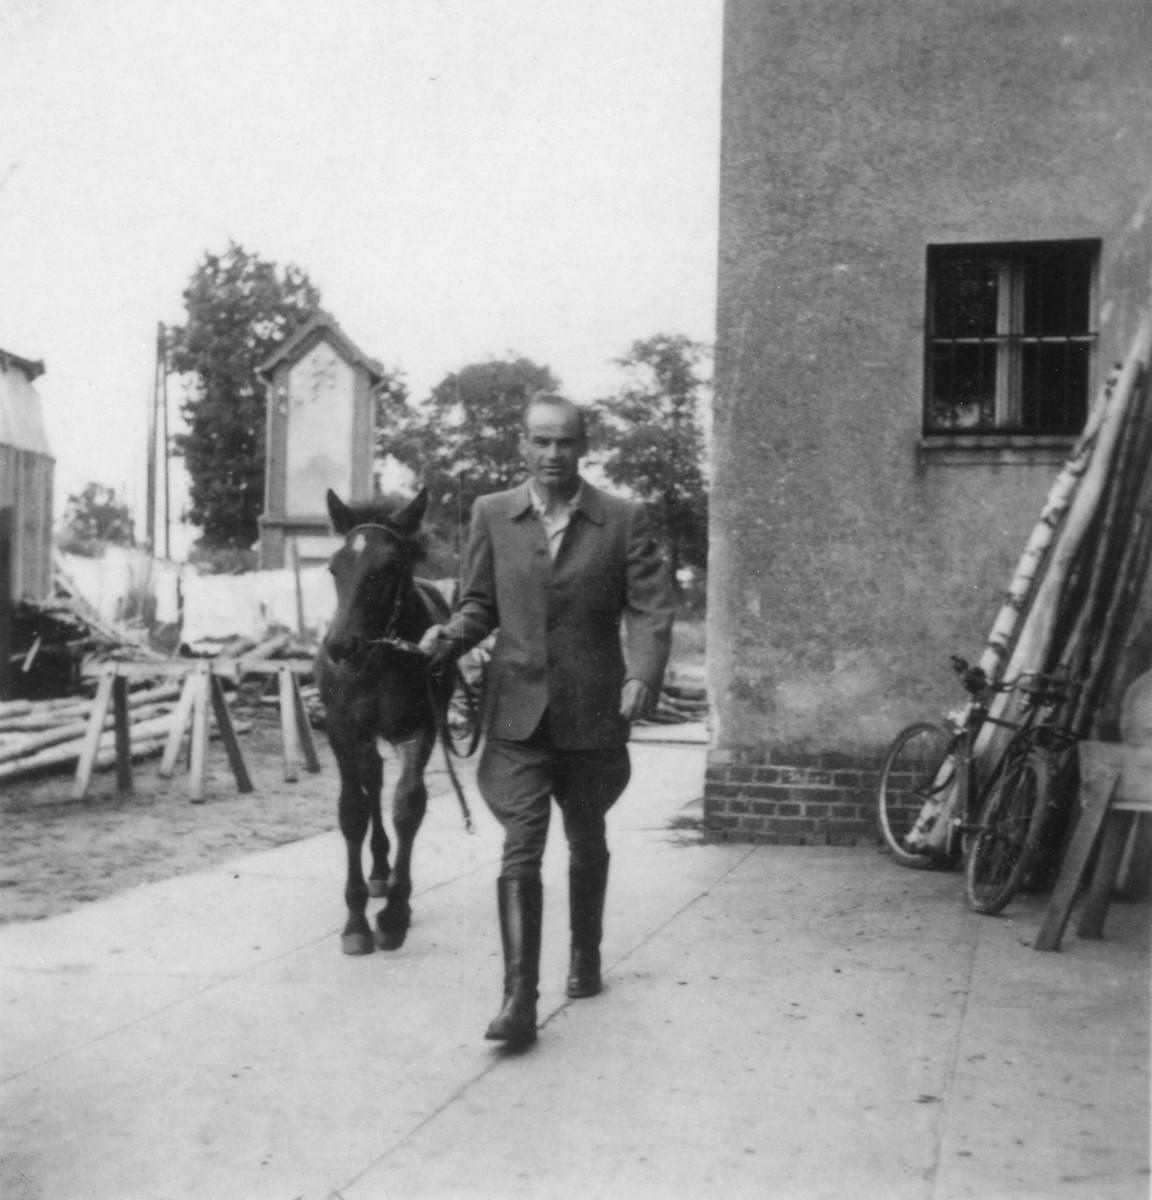 Prof. Dr. Kurt Bondy, director of the Gross Breesen agricultural training center, walks his horse Edgar.  Prior to the Nazi regime, Dr. Bondy had been a professor of jurisprudence in Hamburg.